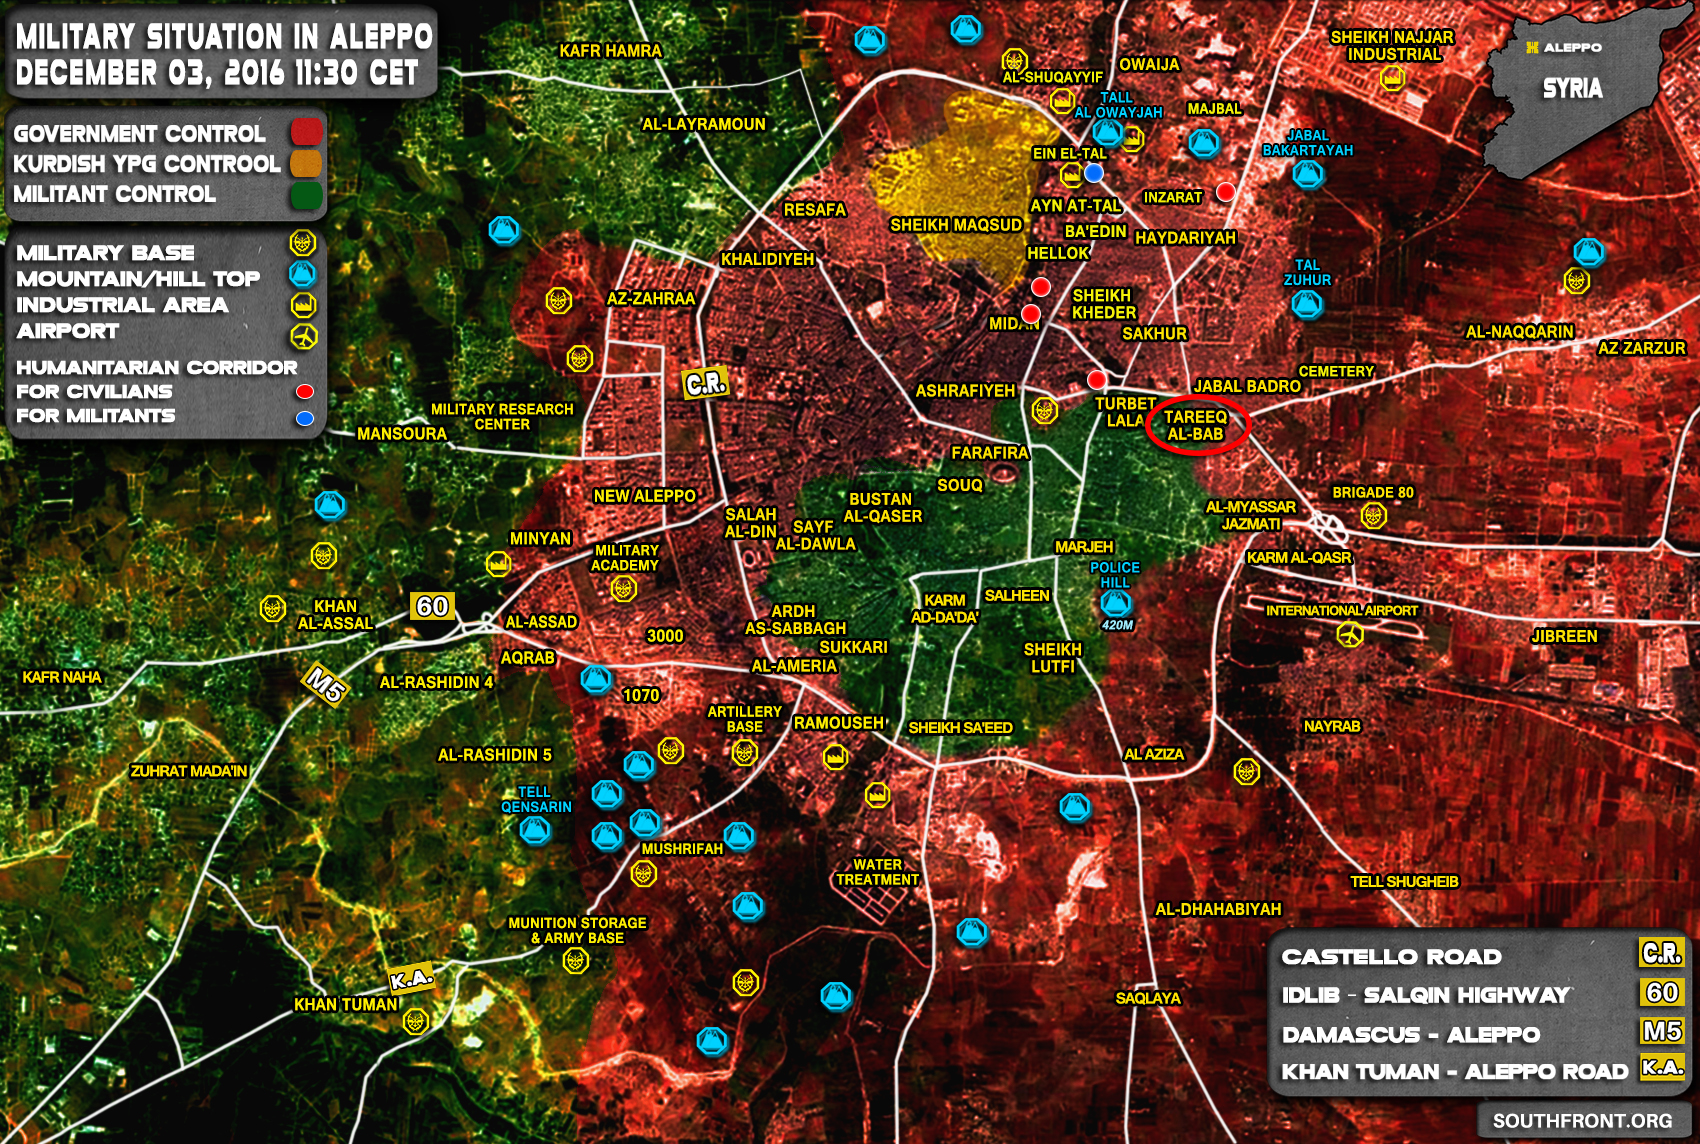 Syrian Army Sets Full Control over Tareeq al-Bab District of Aleppo City